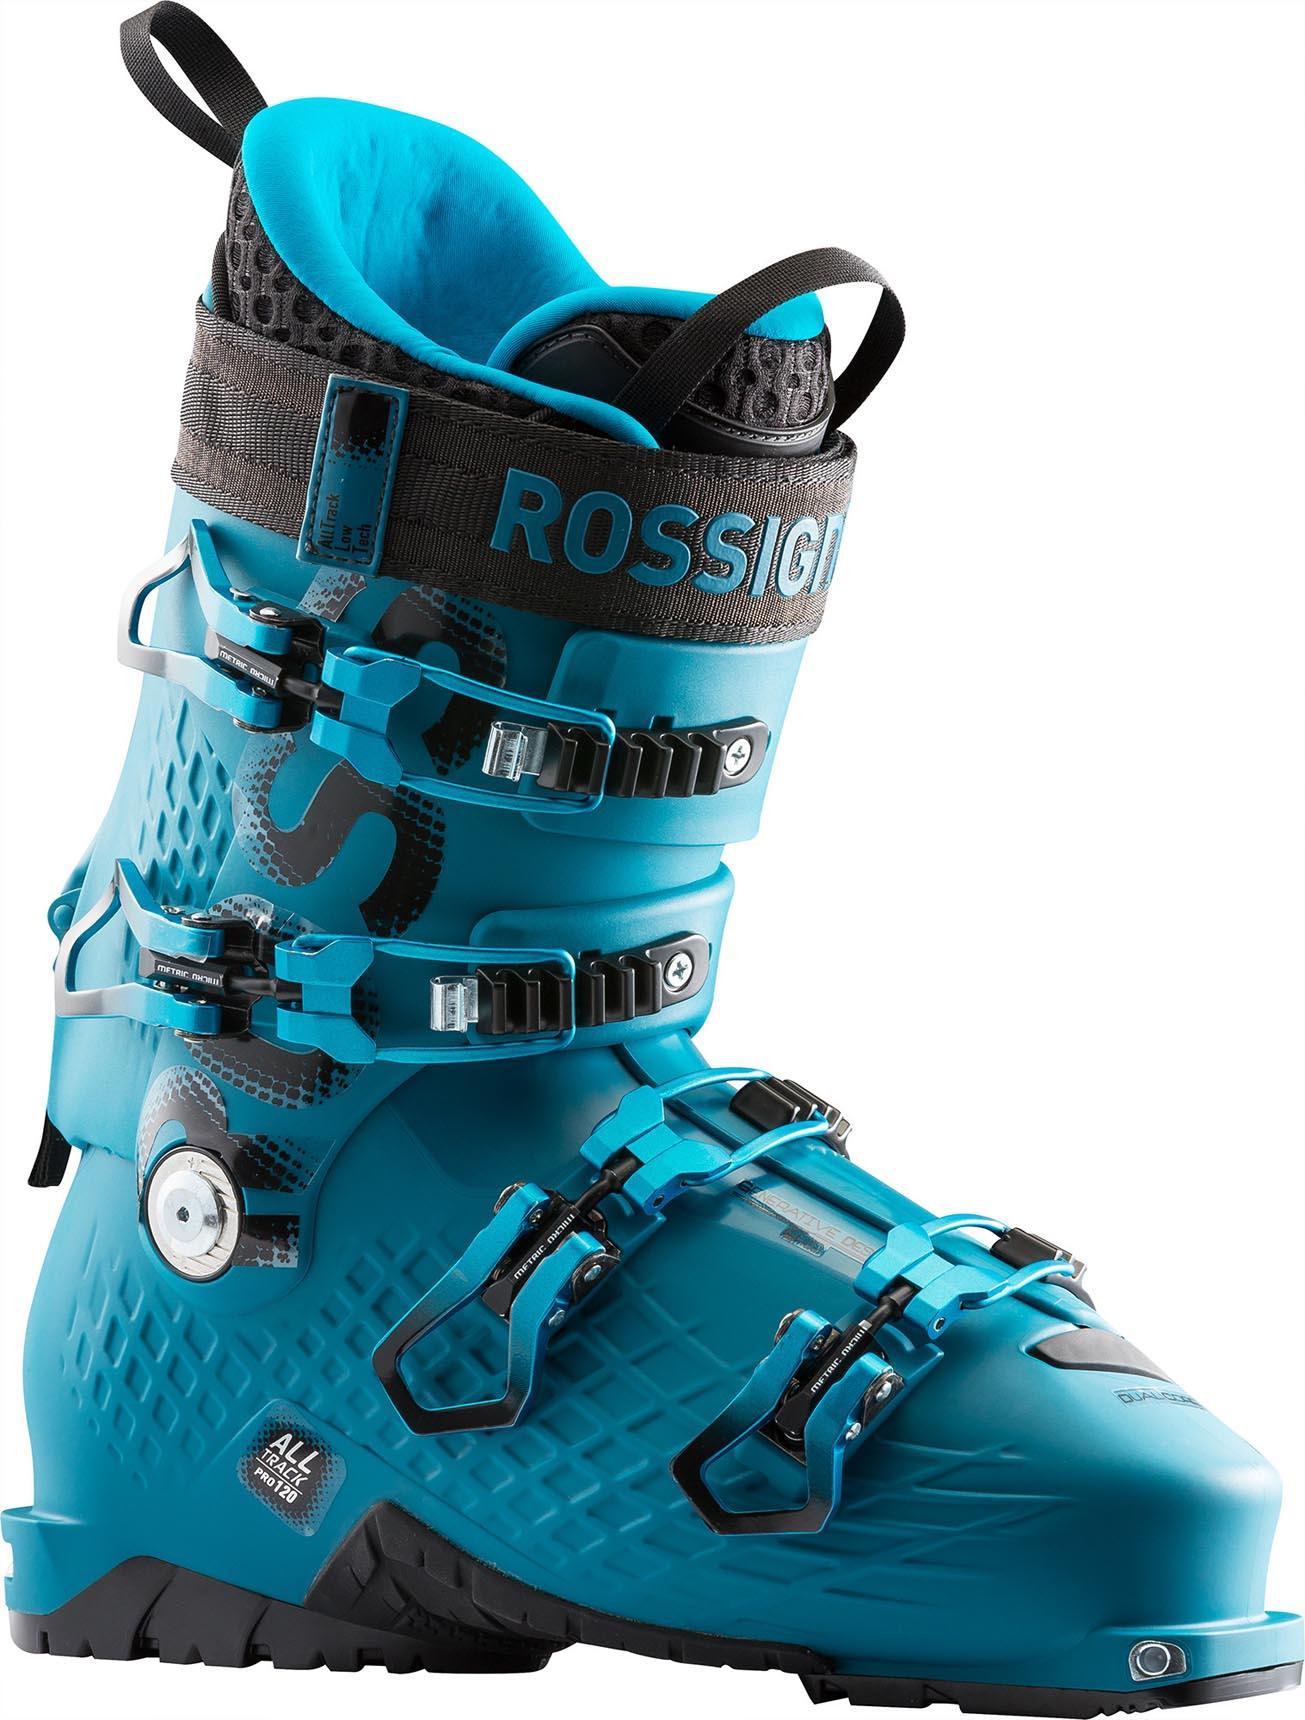 Acheter Chaussures de ski Salomon S PRO 120 CHC online